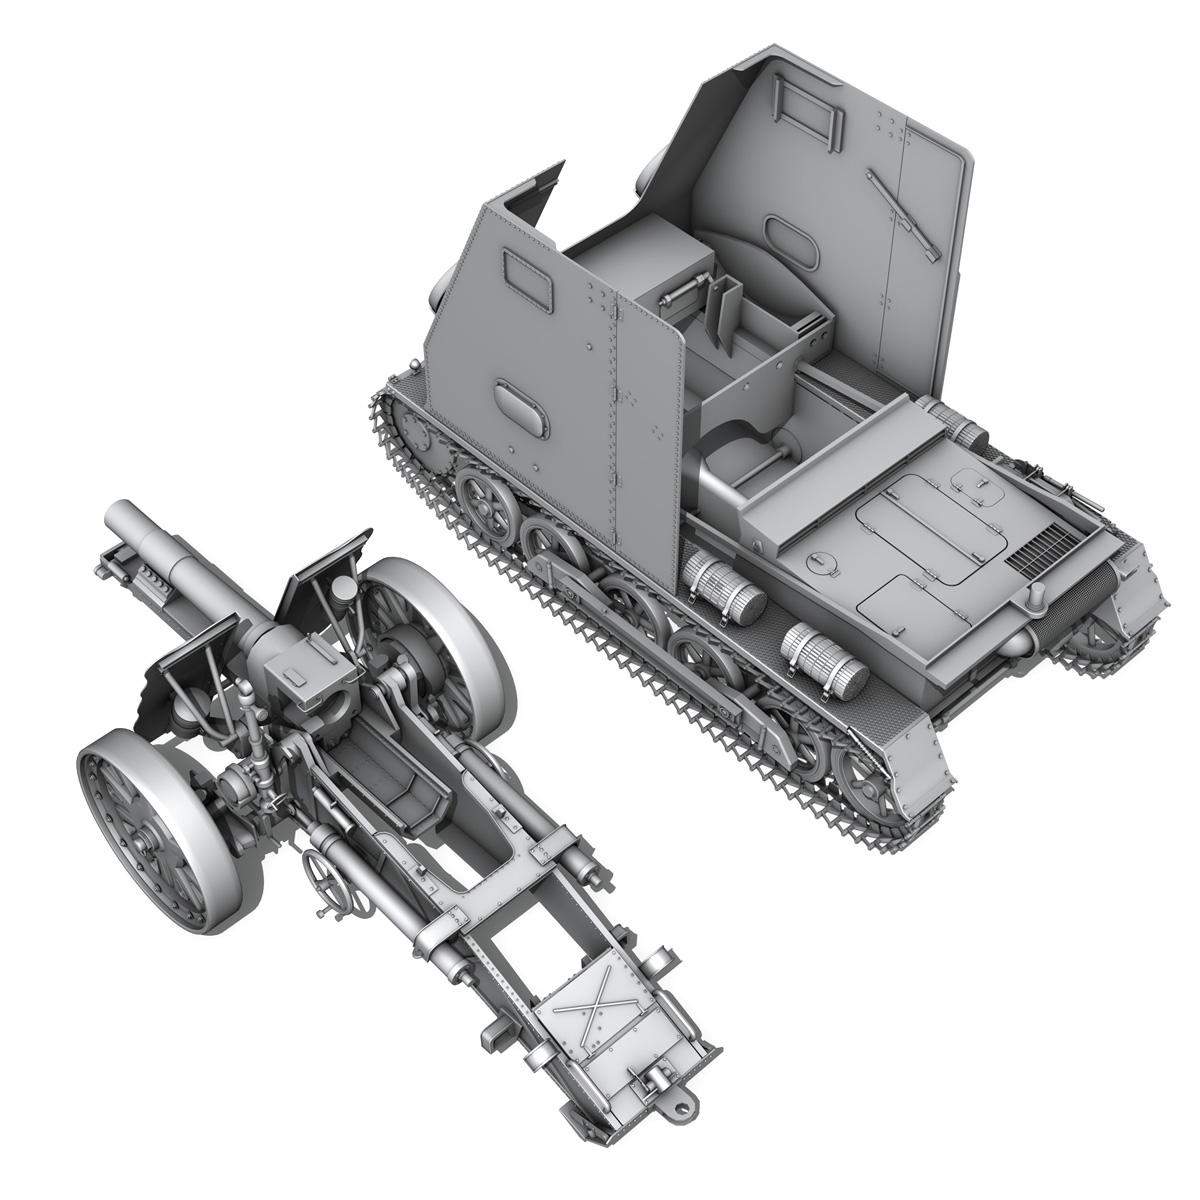 sd.kfz 101 – sturmpanzer 1 – bison 3d model 3ds fbx c4d lwo obj 189277